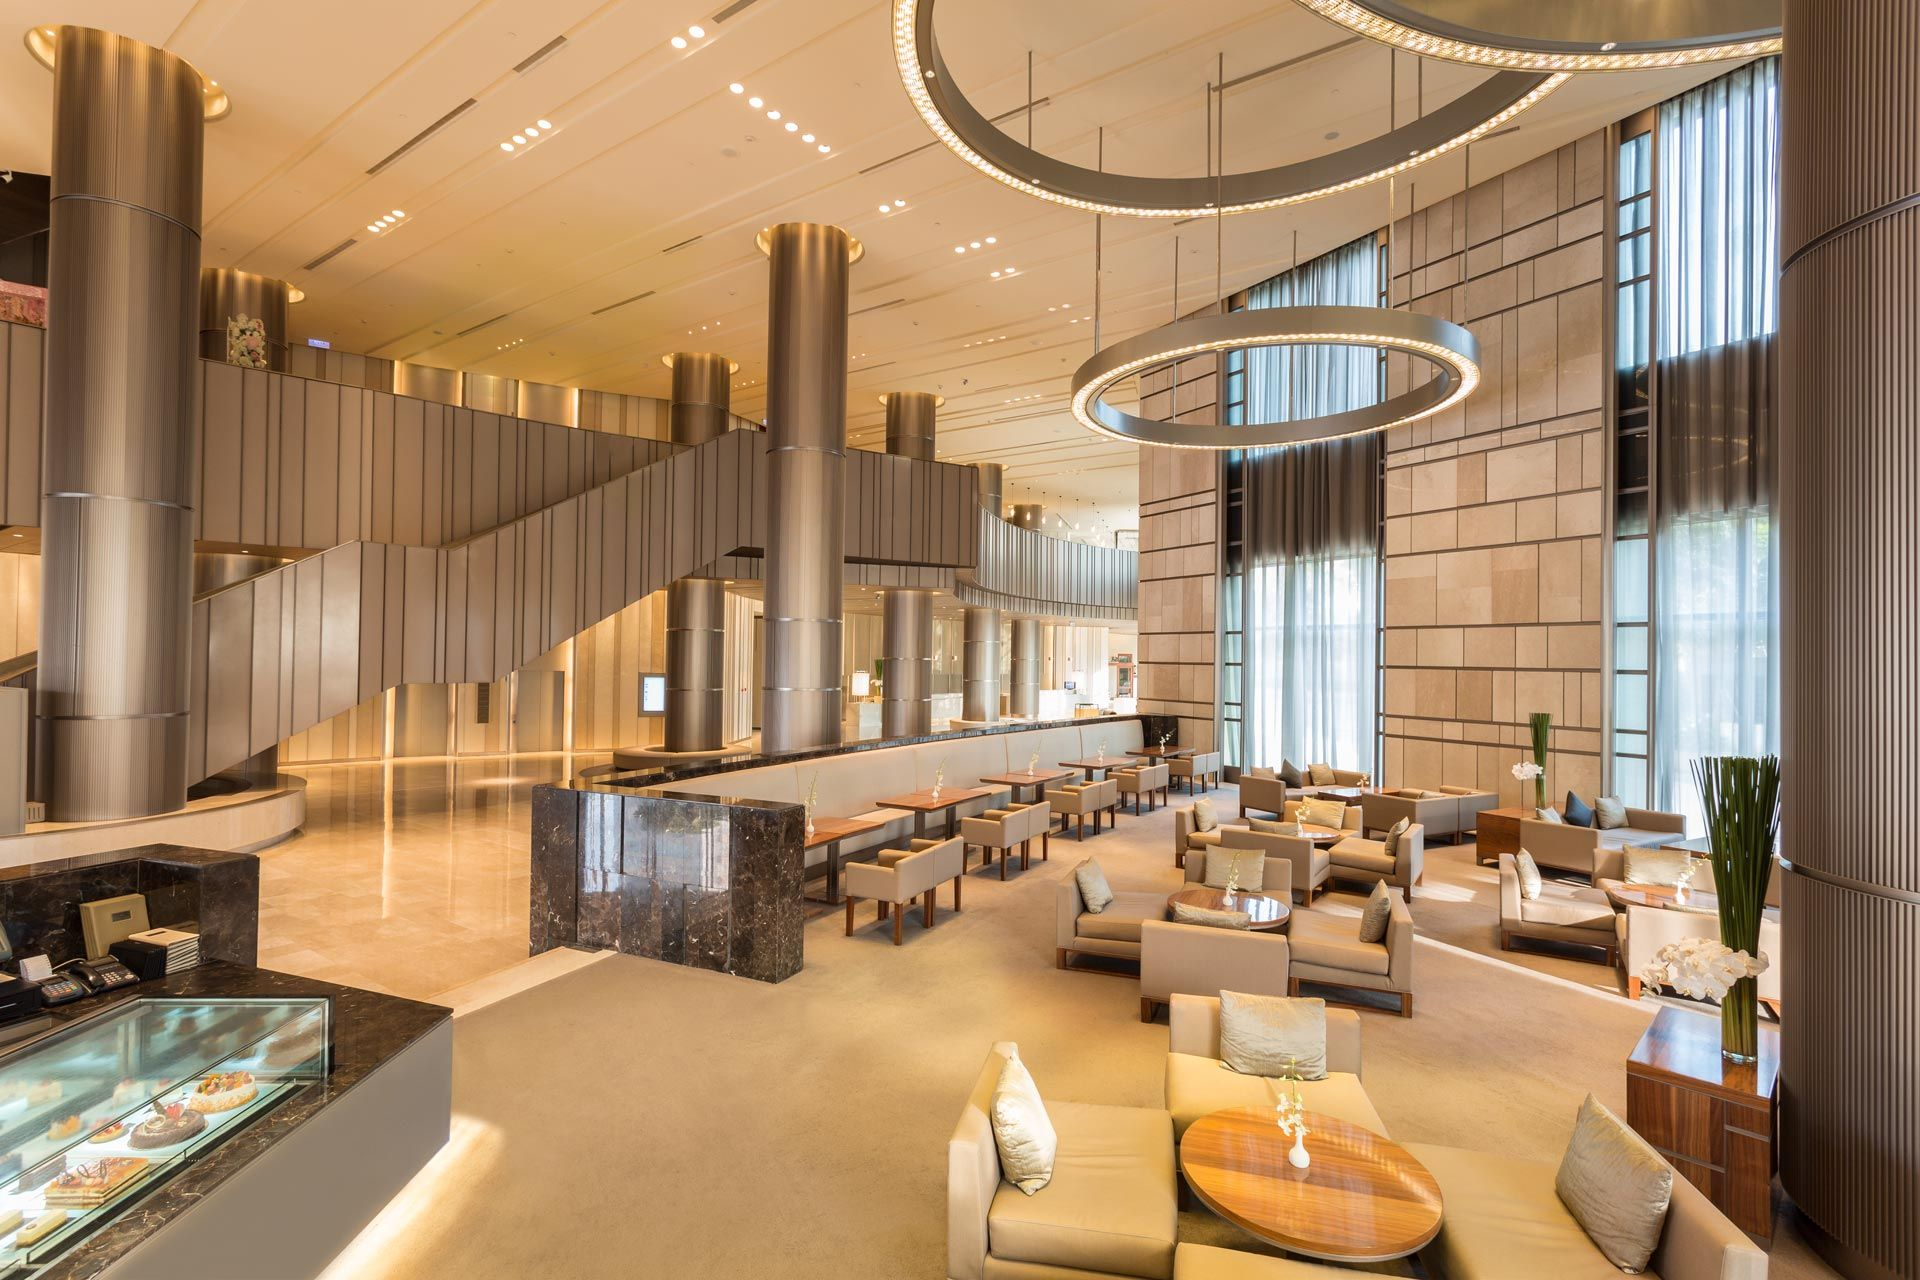 Hotel nikko saigon five star hotel in hcmc hotels in for Design hotel vietnam